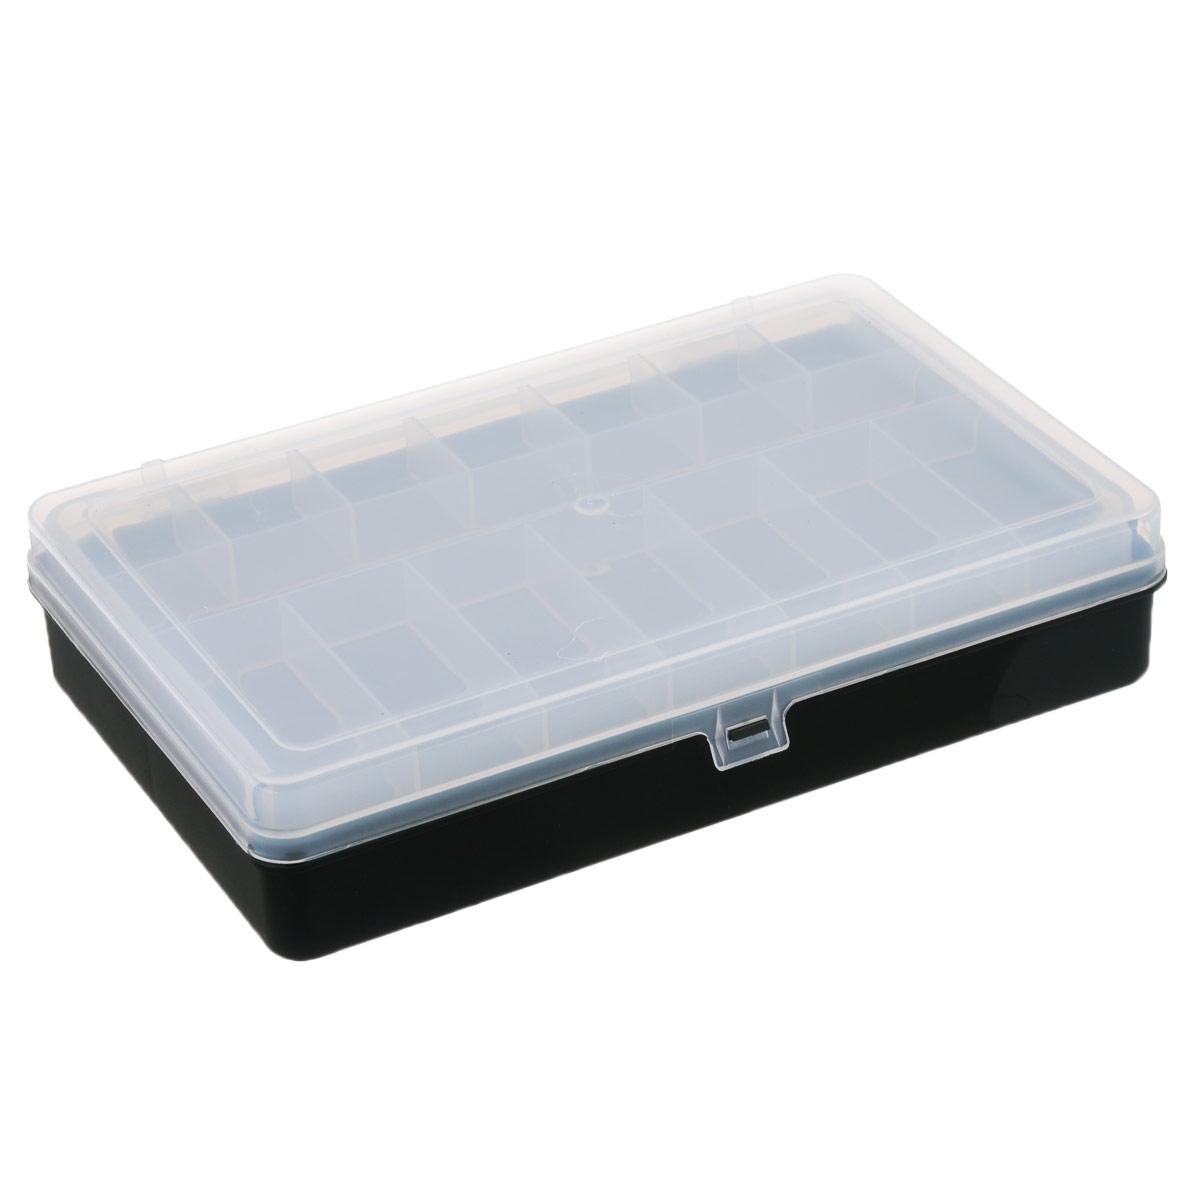 "Коробка для мелочей ""Trivol"", двухъярусная, цвет: черный, 23,5 см х 15 см х 5 см"